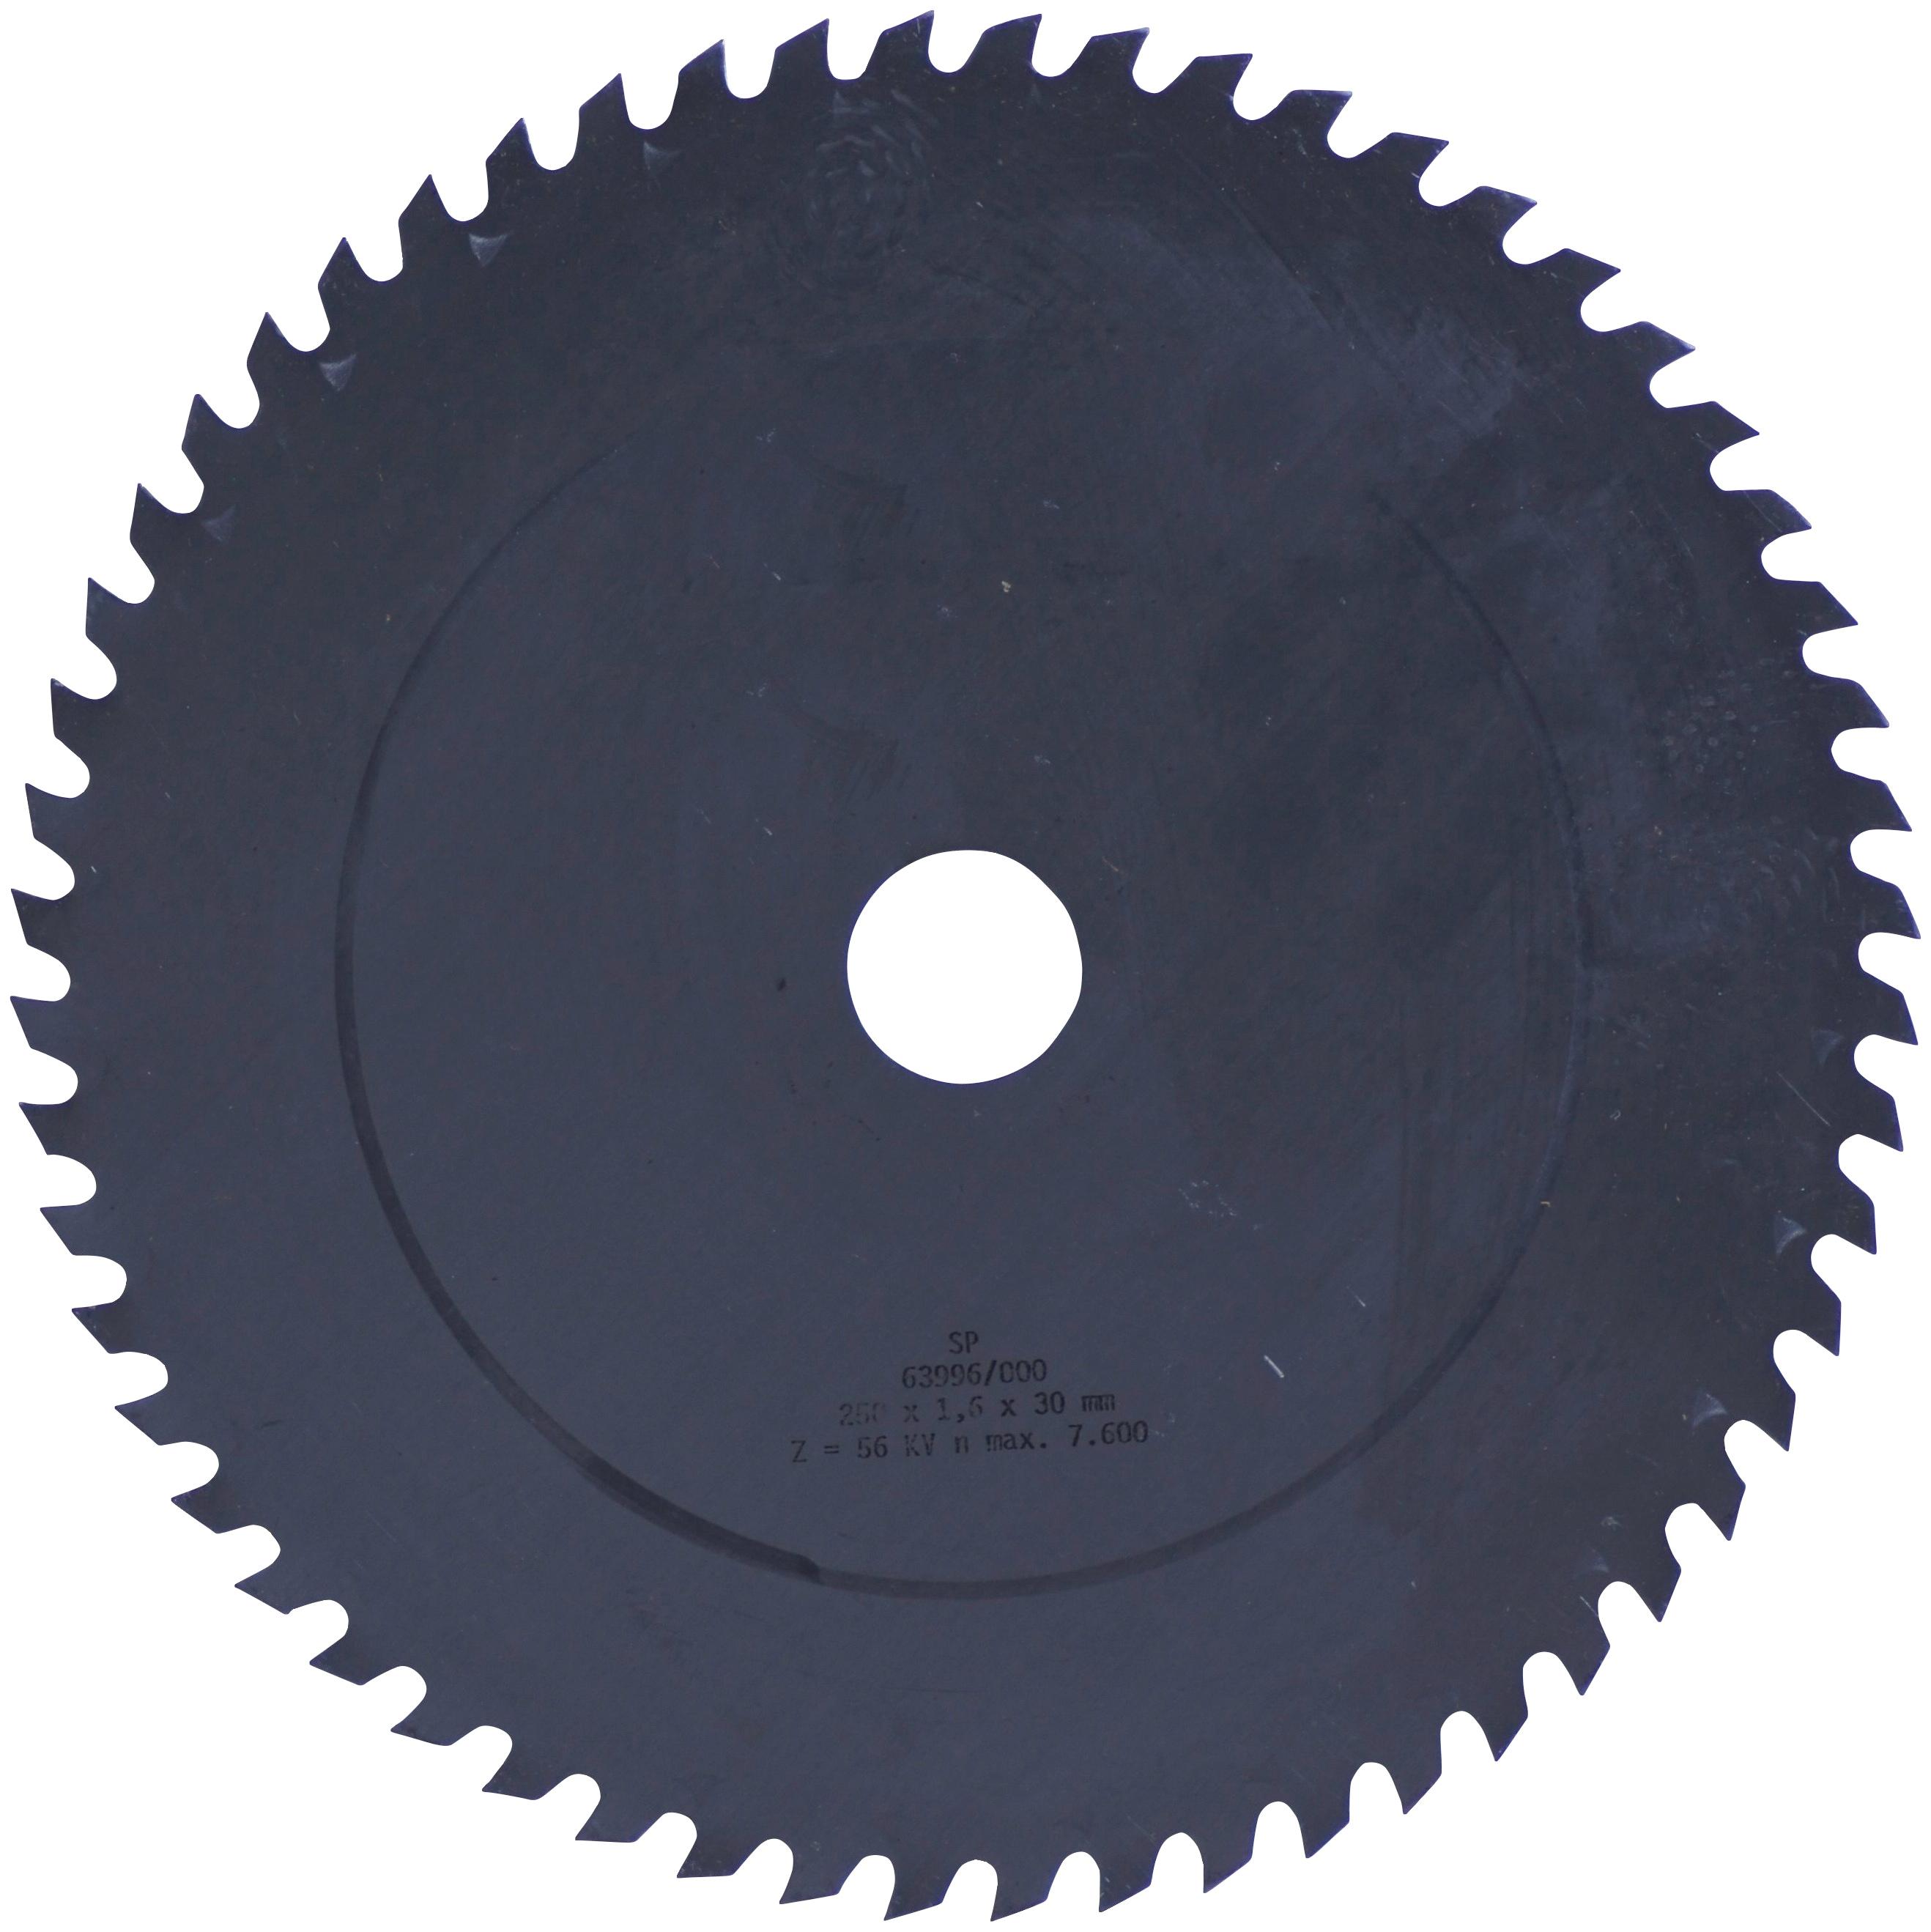 Connex Kreissägeblatt, CV, grob, Ø 250 mm grau Sägen Werkzeug Maschinen Kreissägeblatt